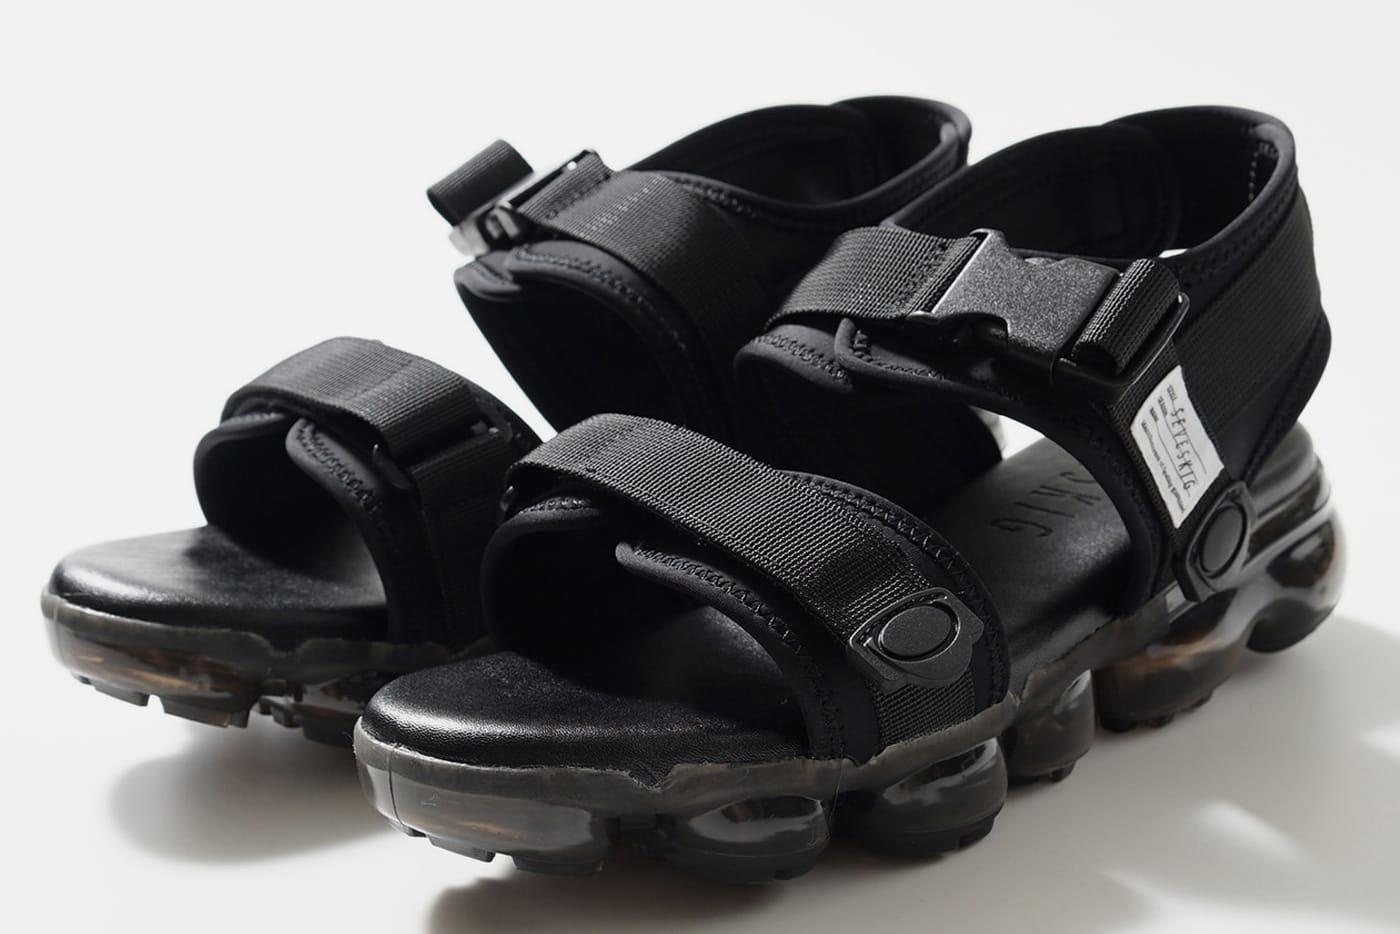 2018 Spring/Summer Air Sole Sandals